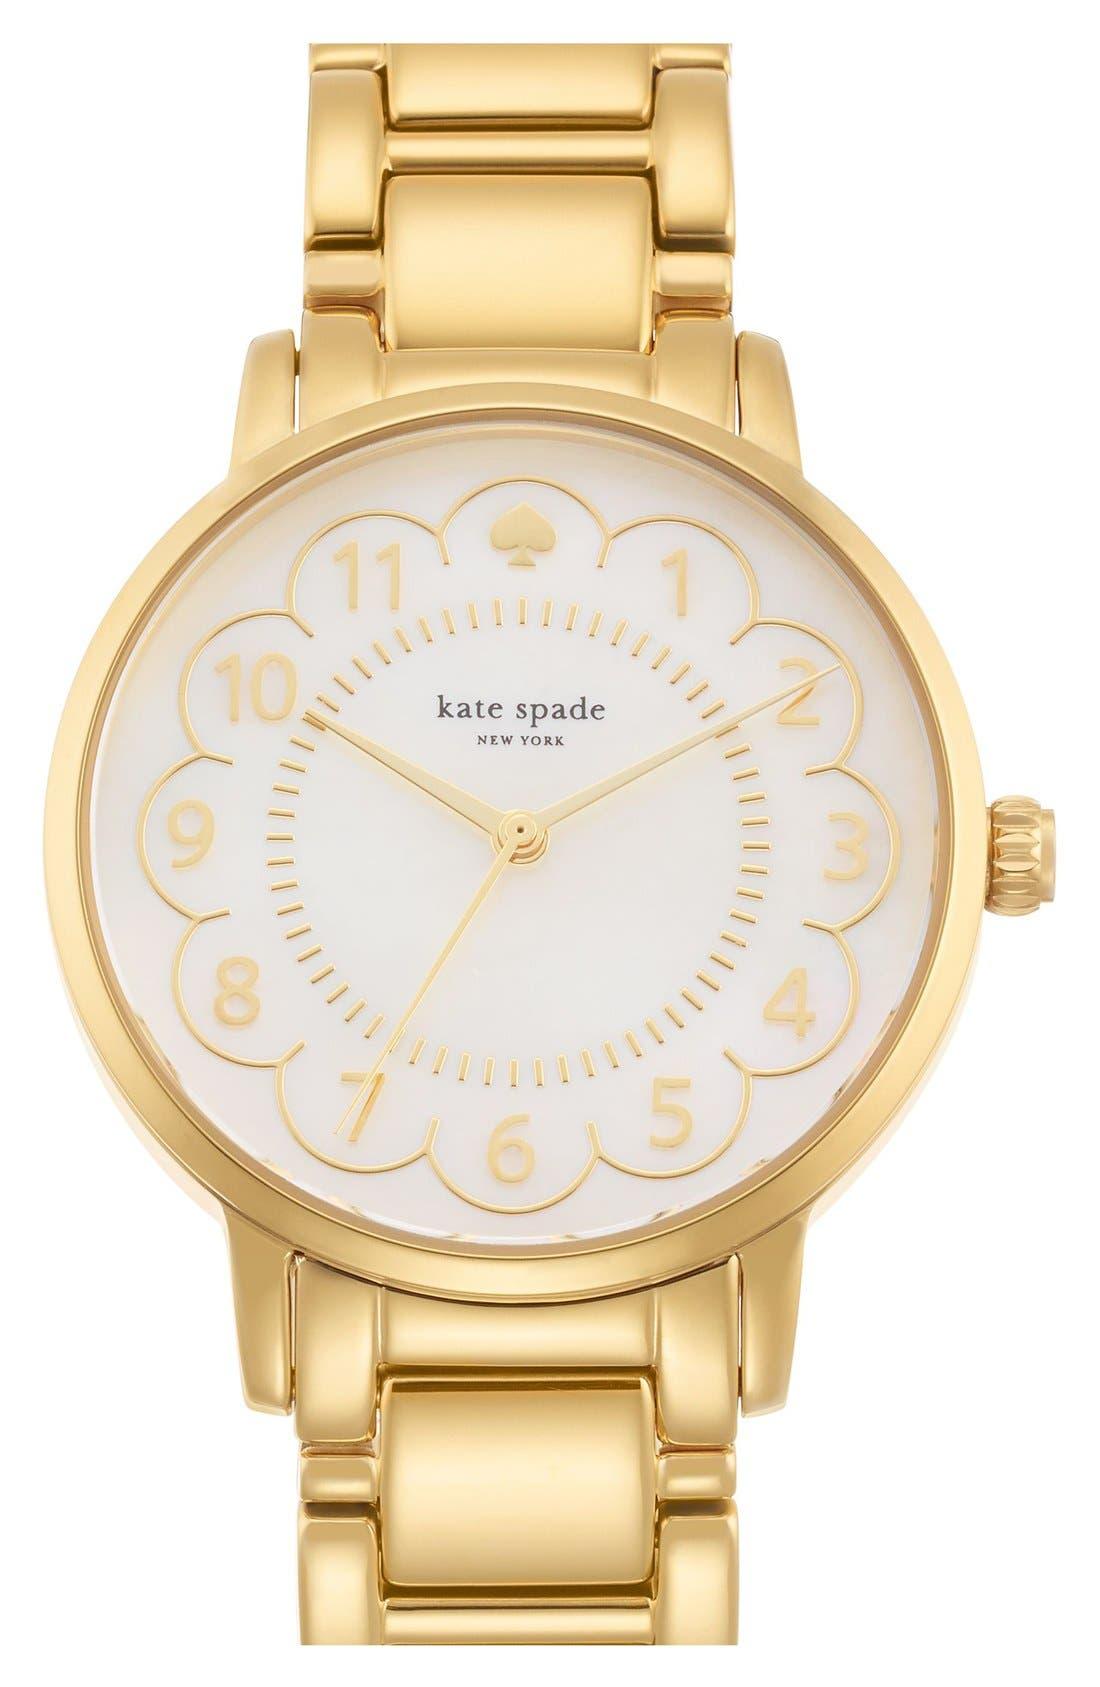 Main Image - kate spade new york 'gramercy' scalloped dial bracelet watch, 34mm